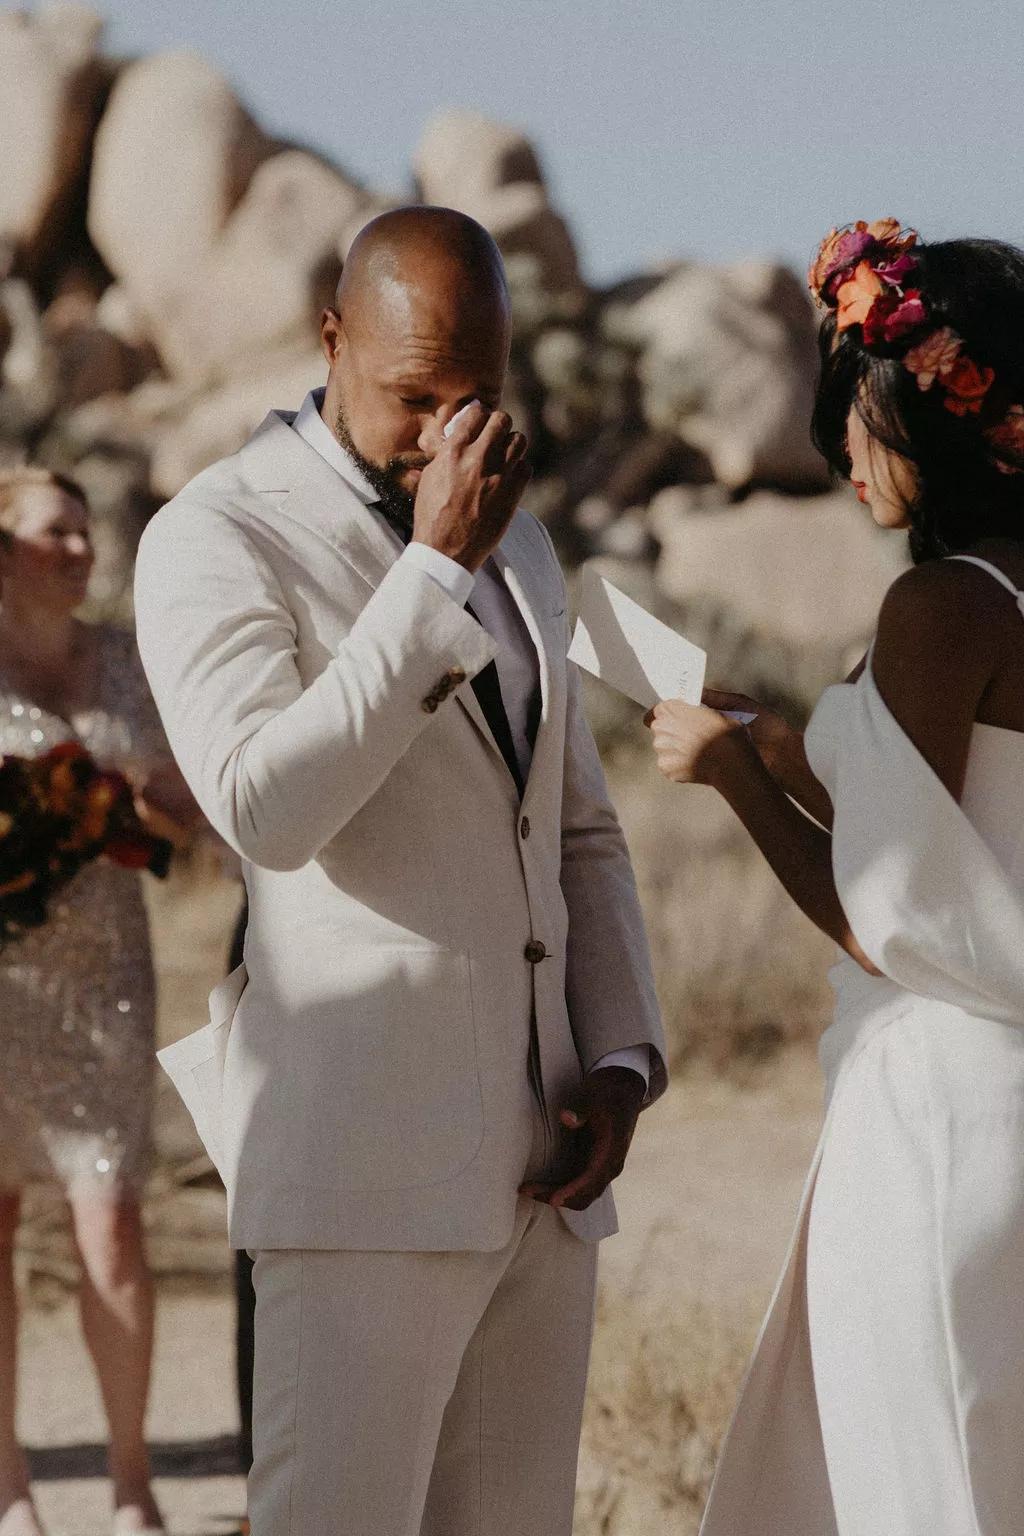 l9Z4u0a1d90 - Найти свадебного ведущего оказалось проще простого